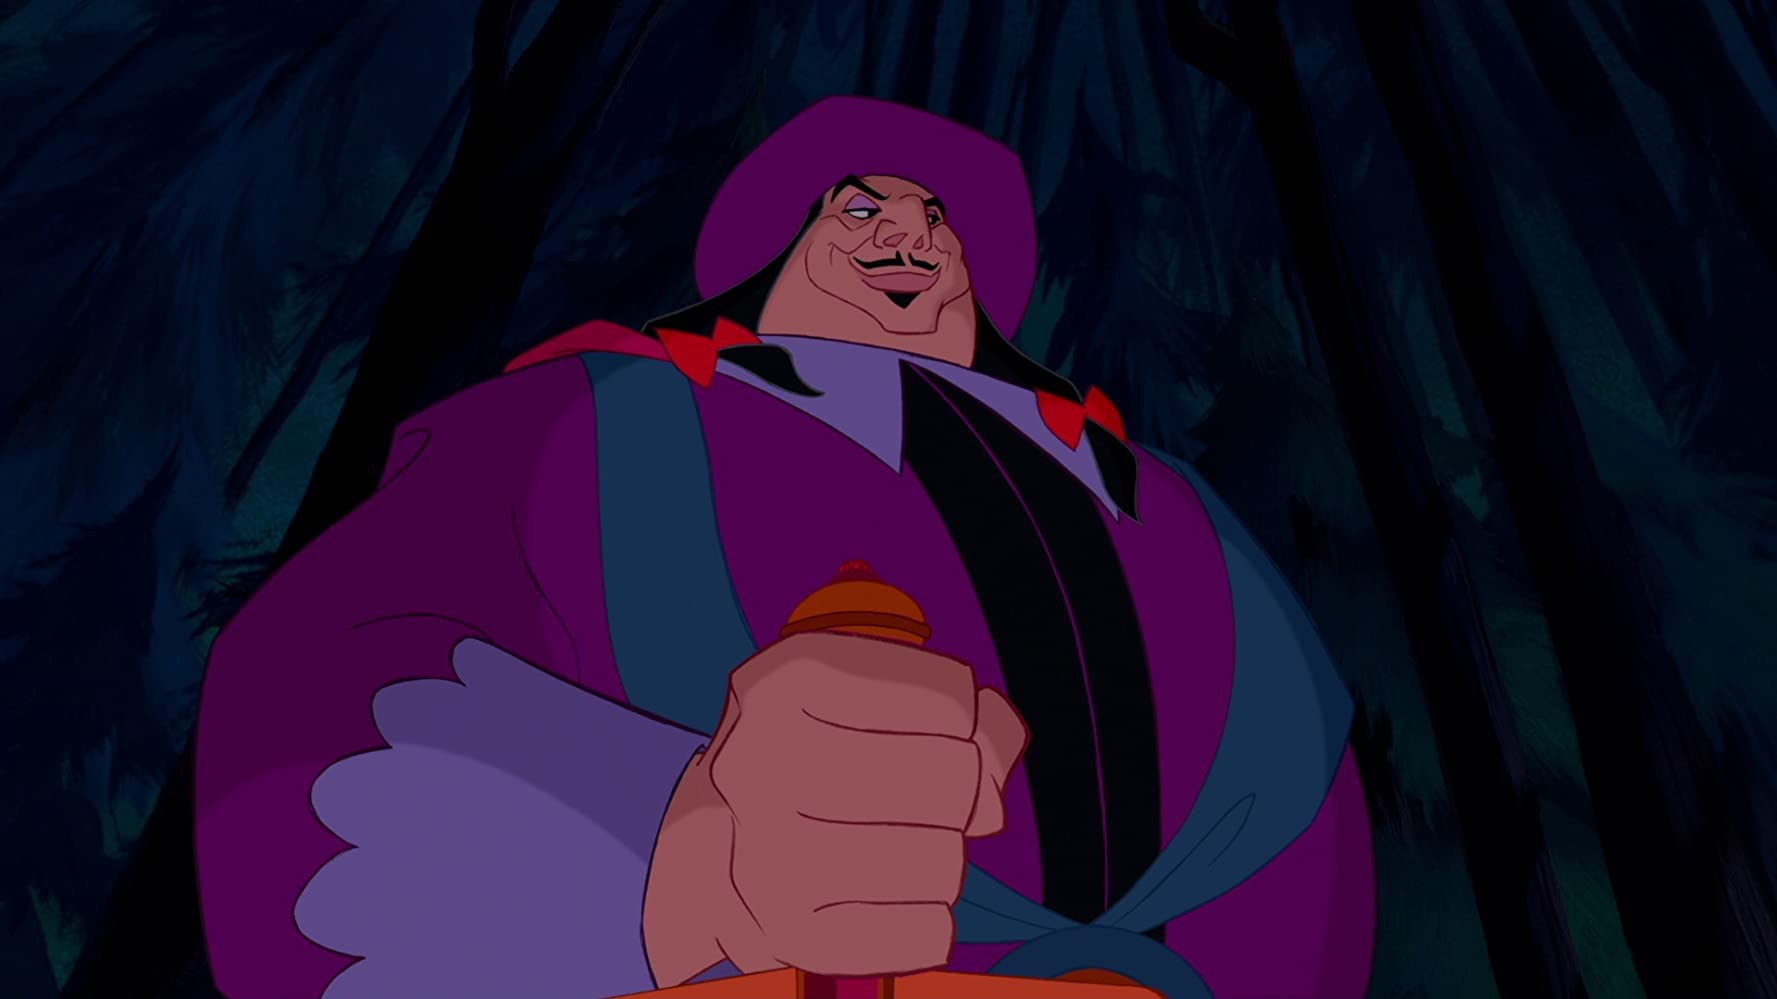 David Ogden Stiers in Pocahontas (1995)